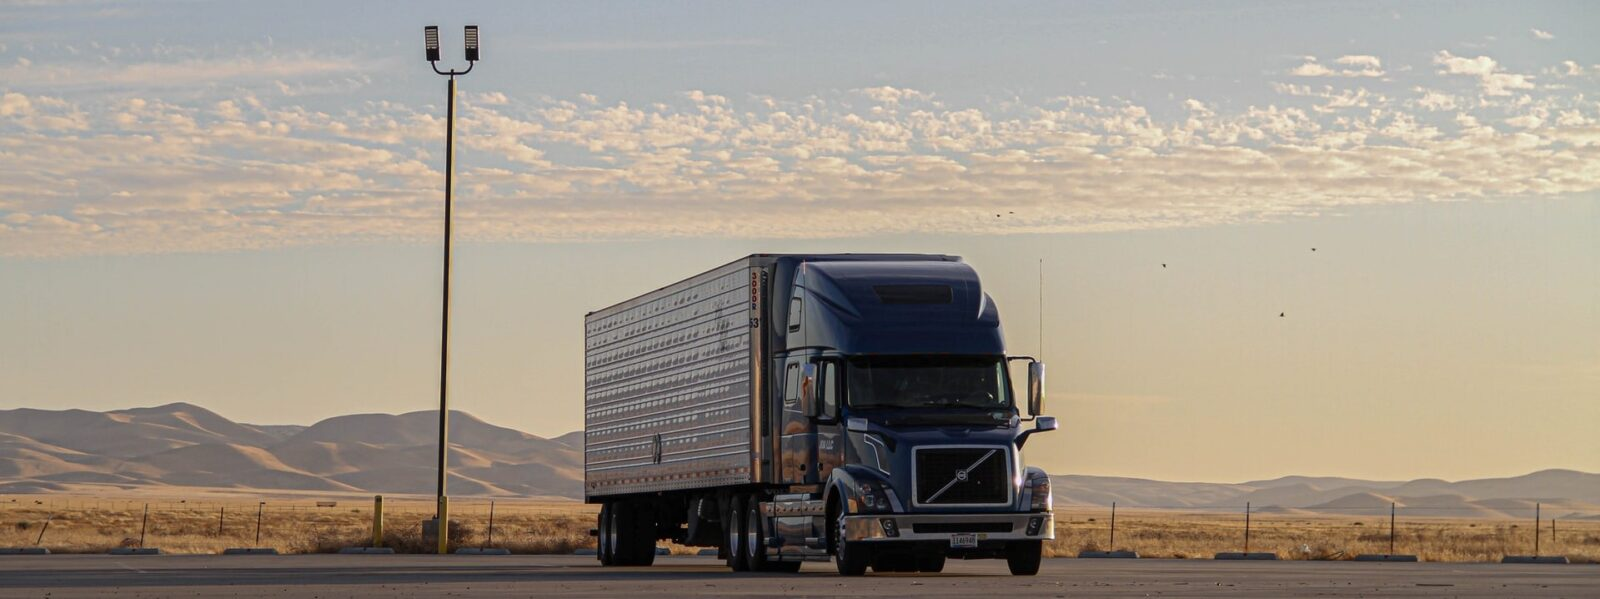 CLD truck